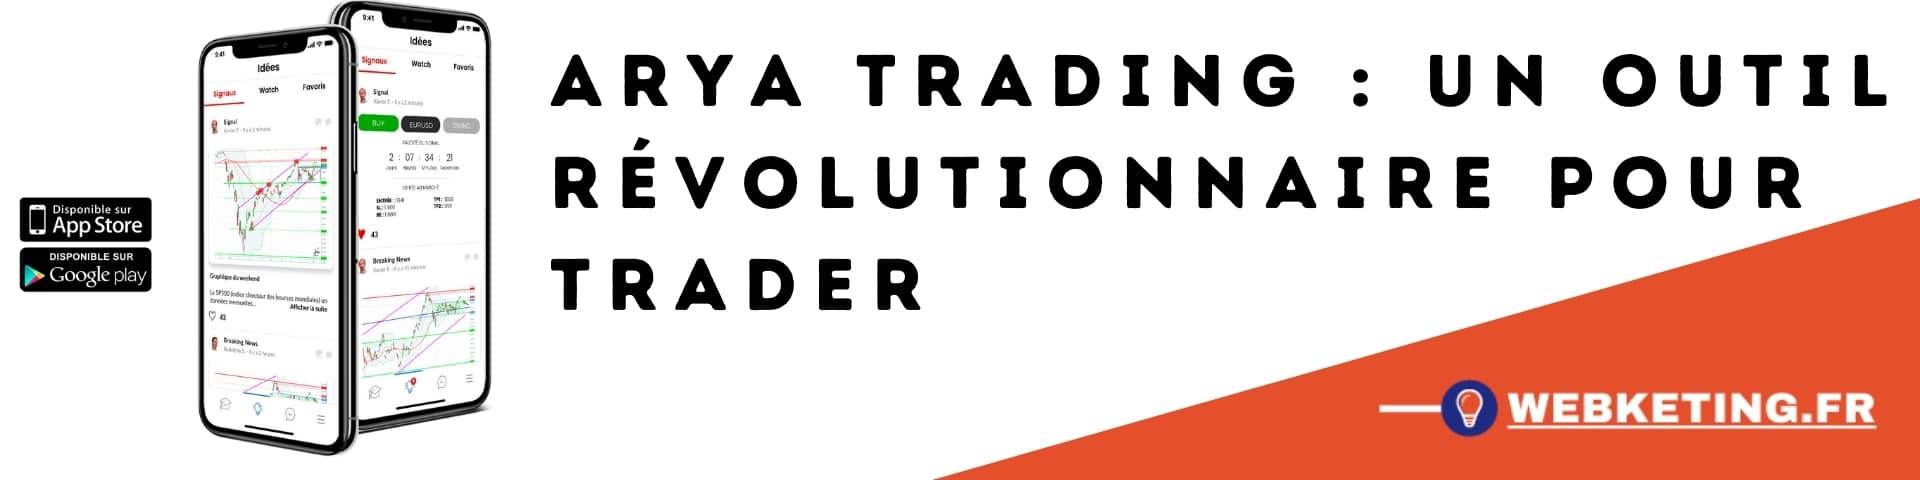 Arya Trading : un outil révolutionnaire pour trader